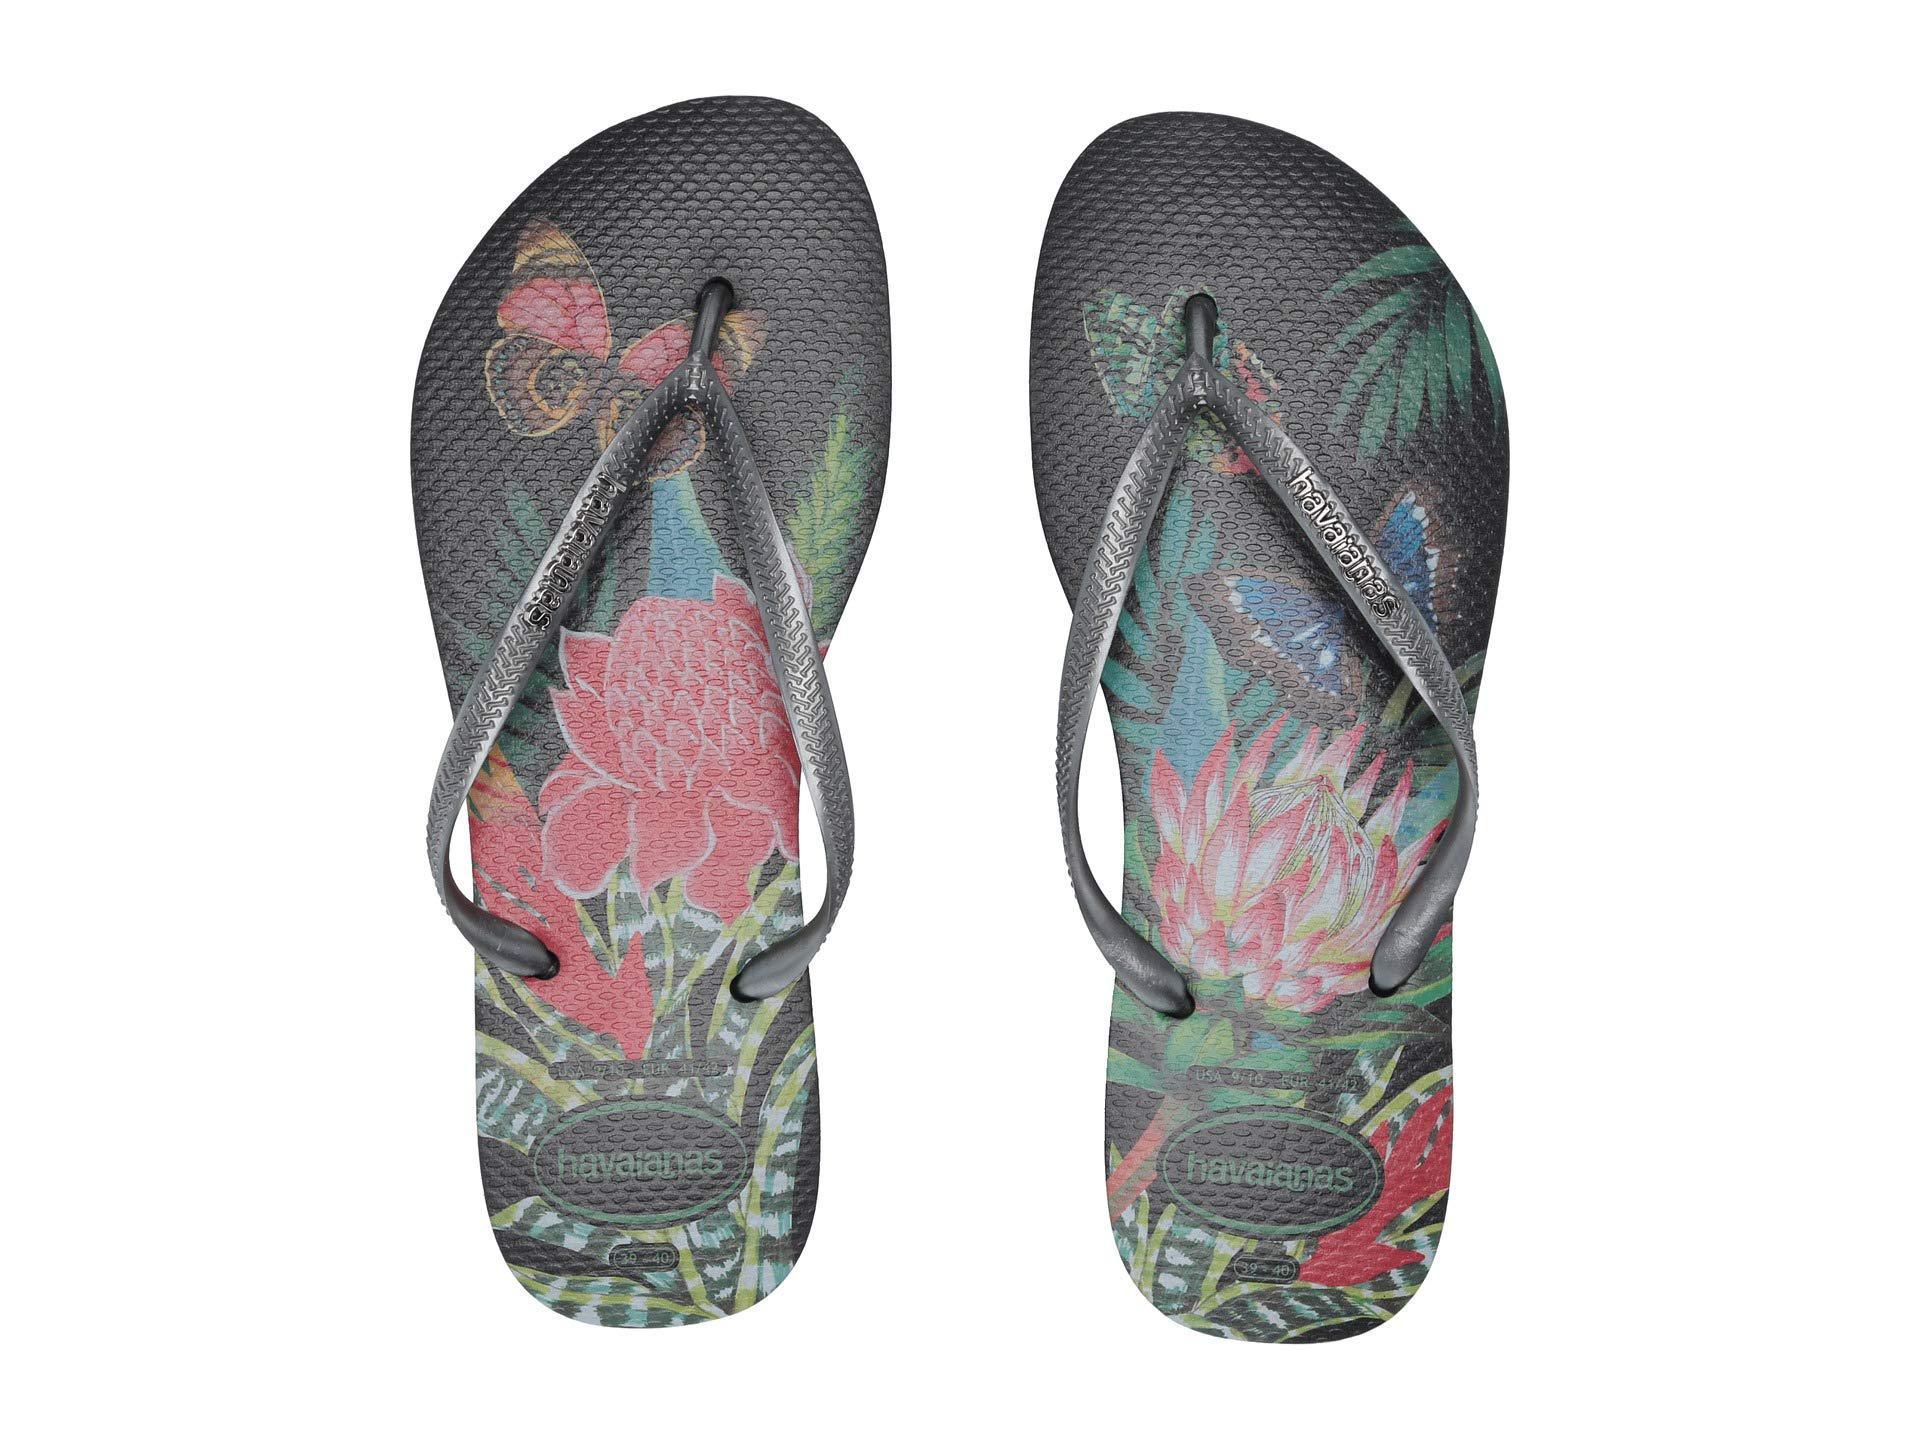 a7b42ad01d04 Havaianas - Slim Tropical Flip Flops (black graphite) Women s Sandals -  Lyst. View fullscreen